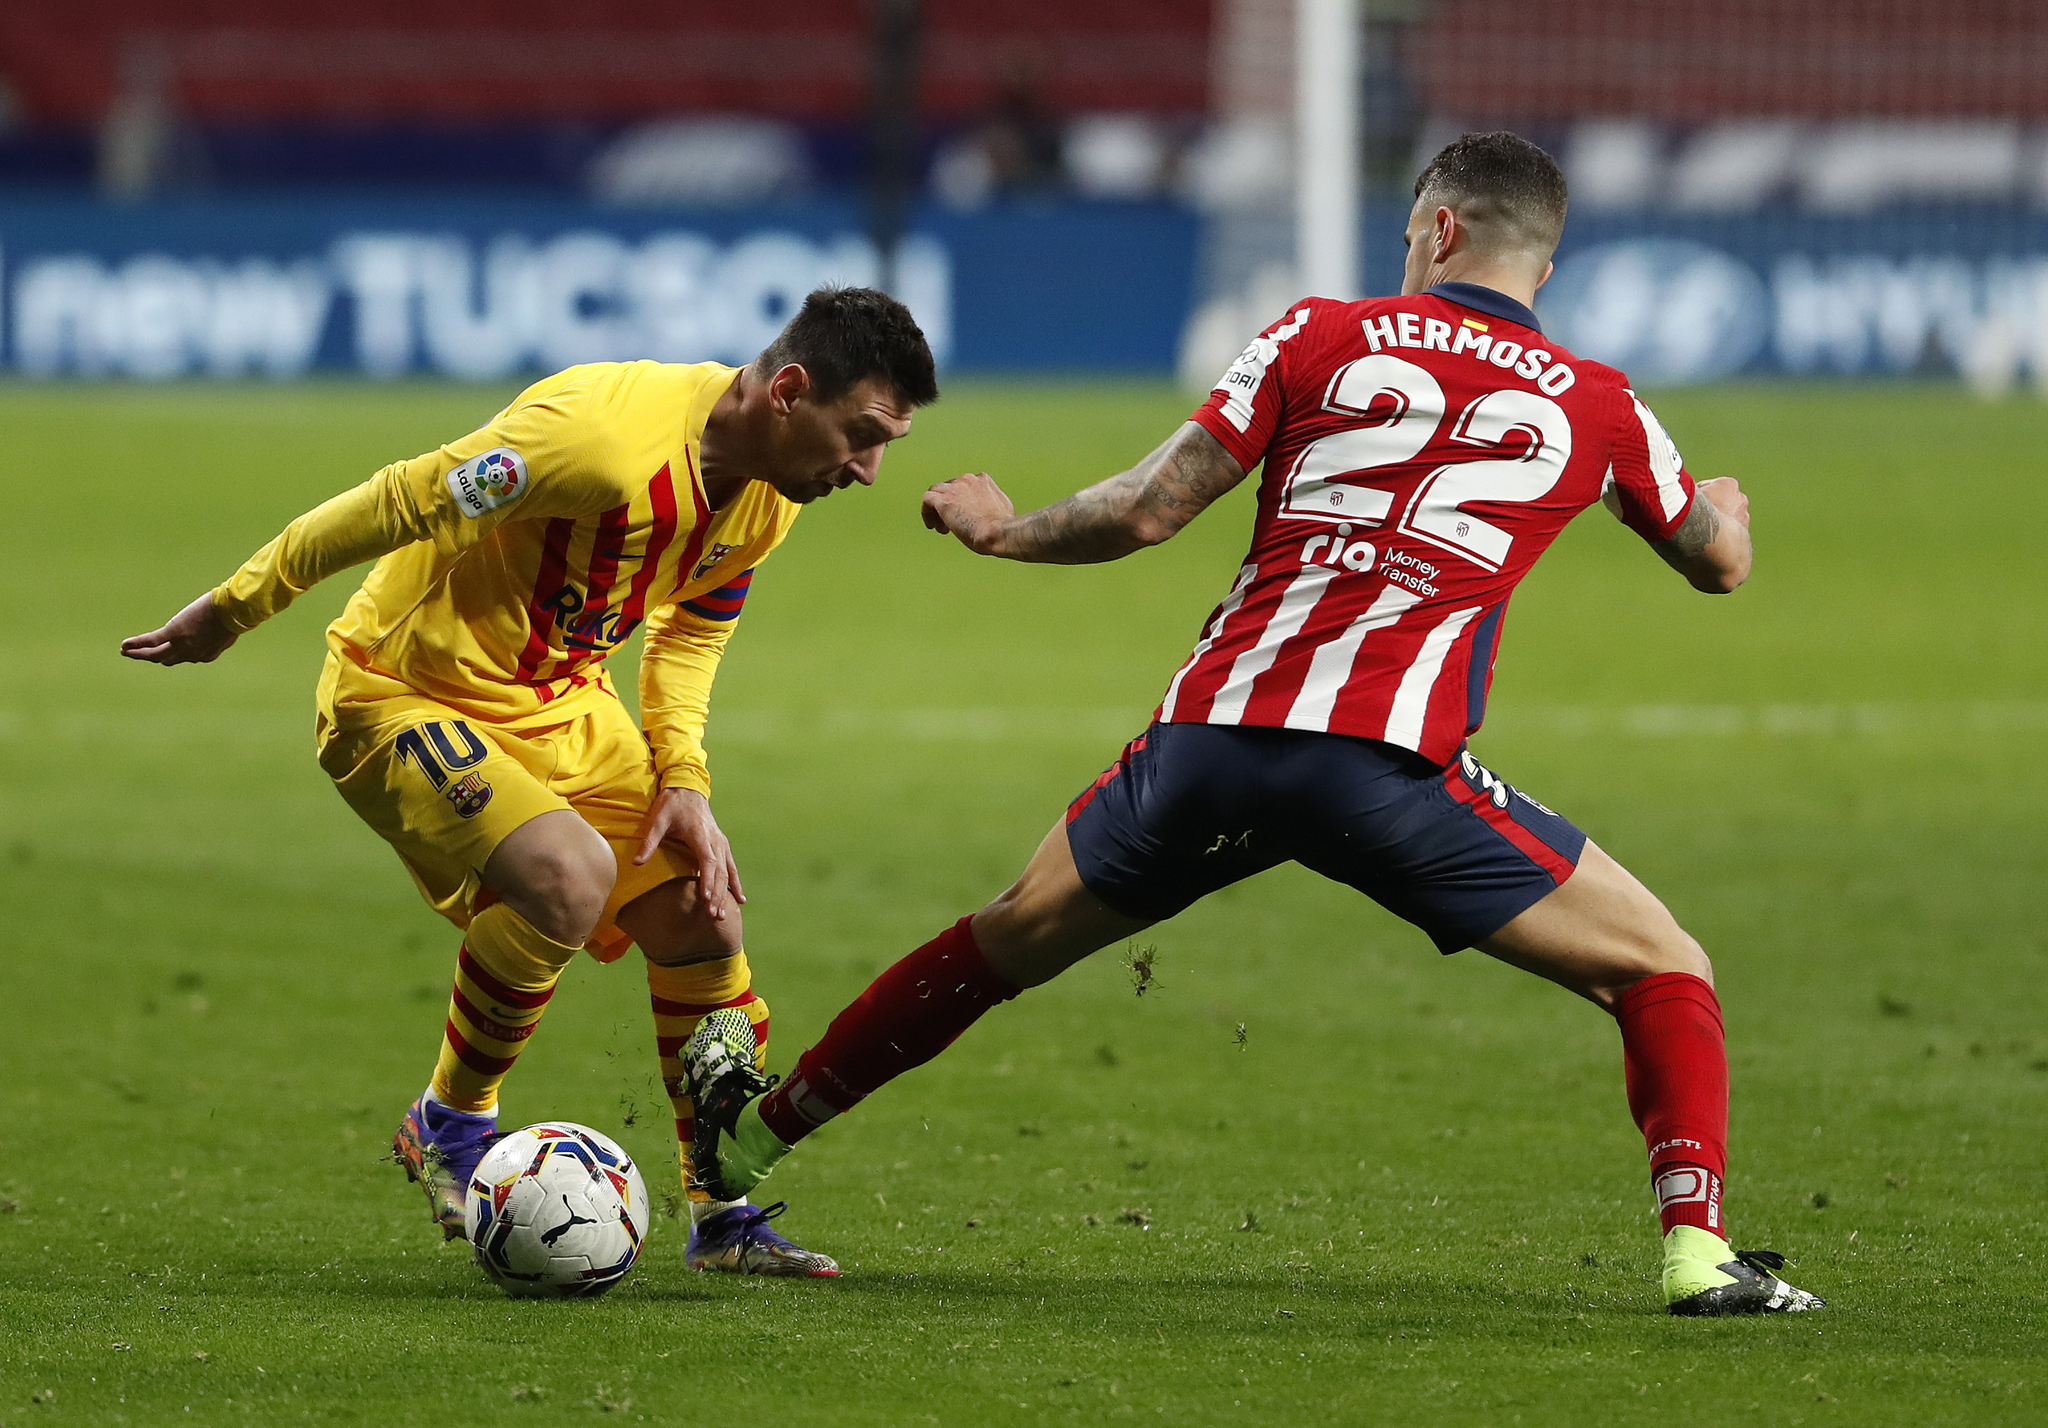 ATLETICO DE MADRID-FC BARCELONA